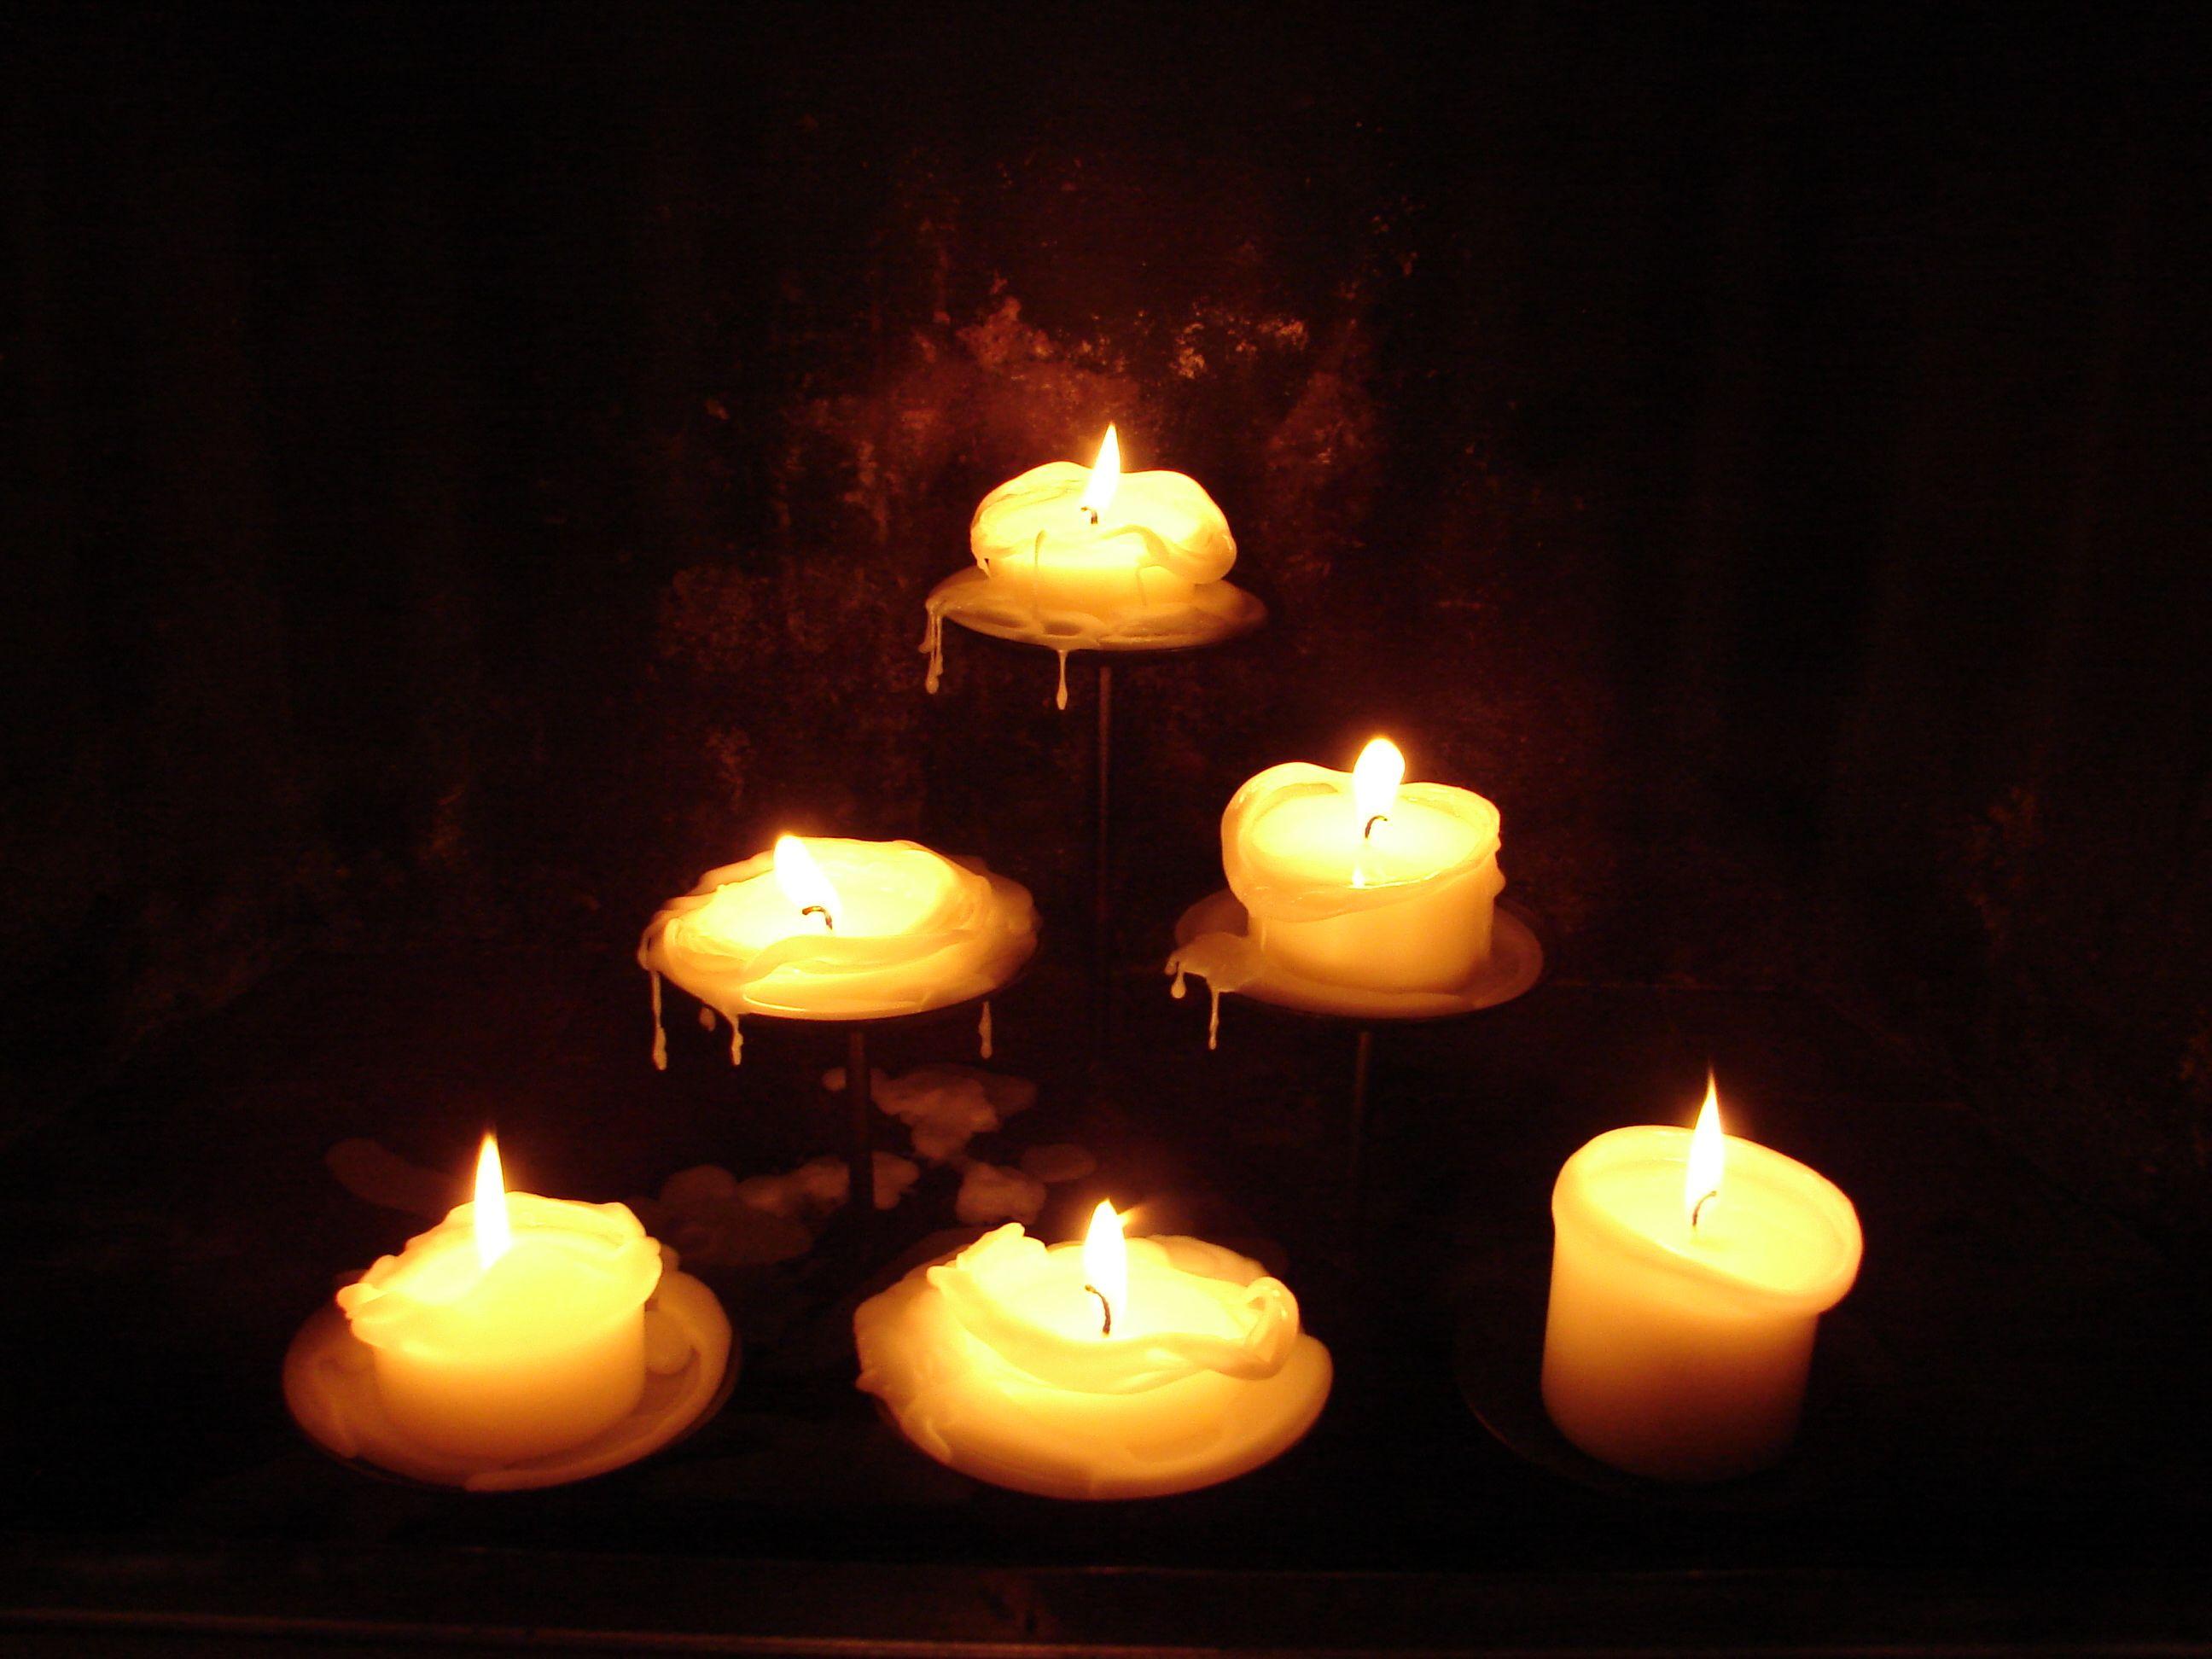 6 Pillar Candles Burned Down 2 by `FantasyStock on deviantART